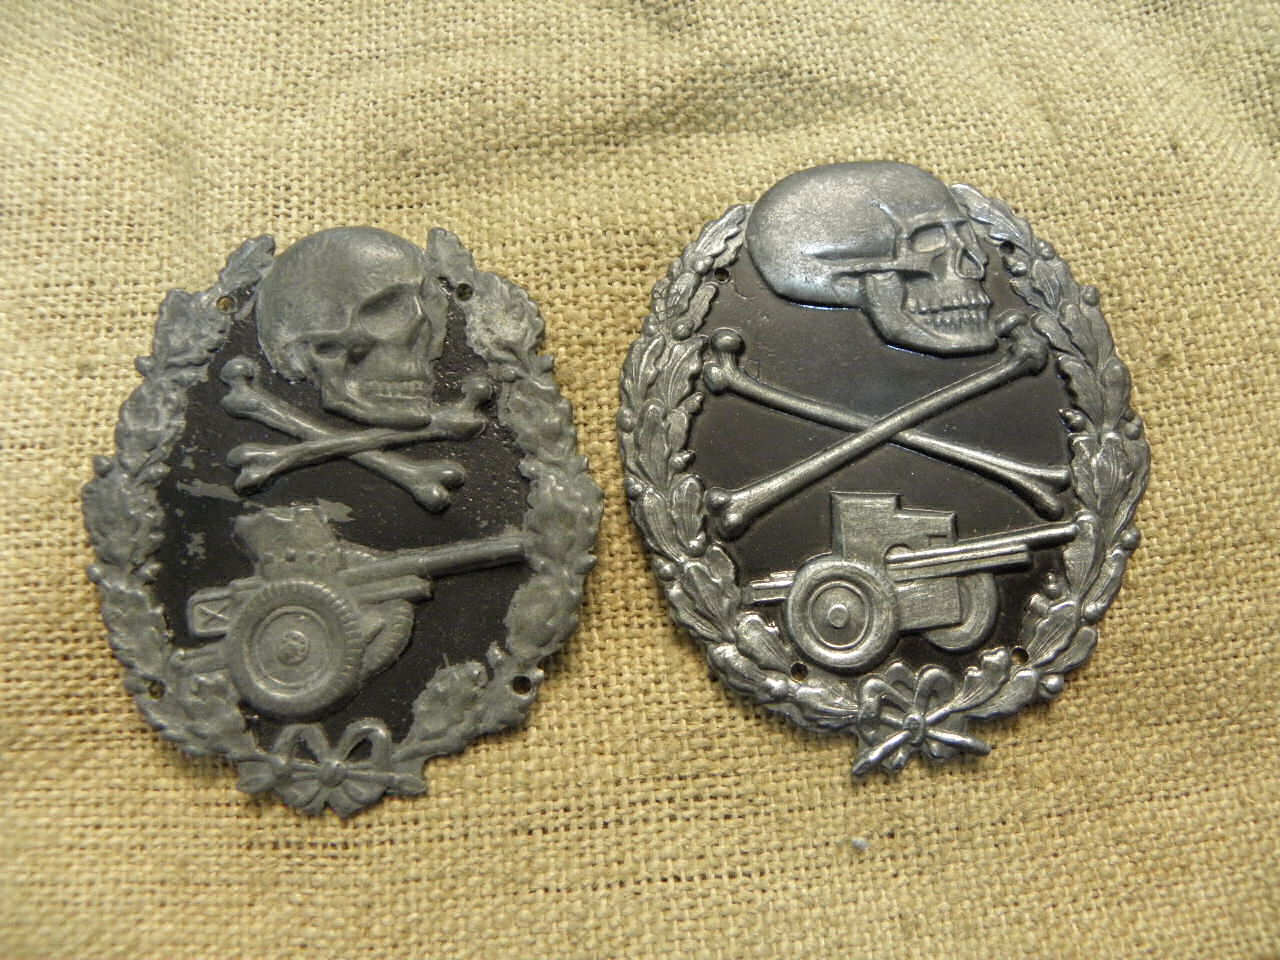 Distintivos militares metálicos